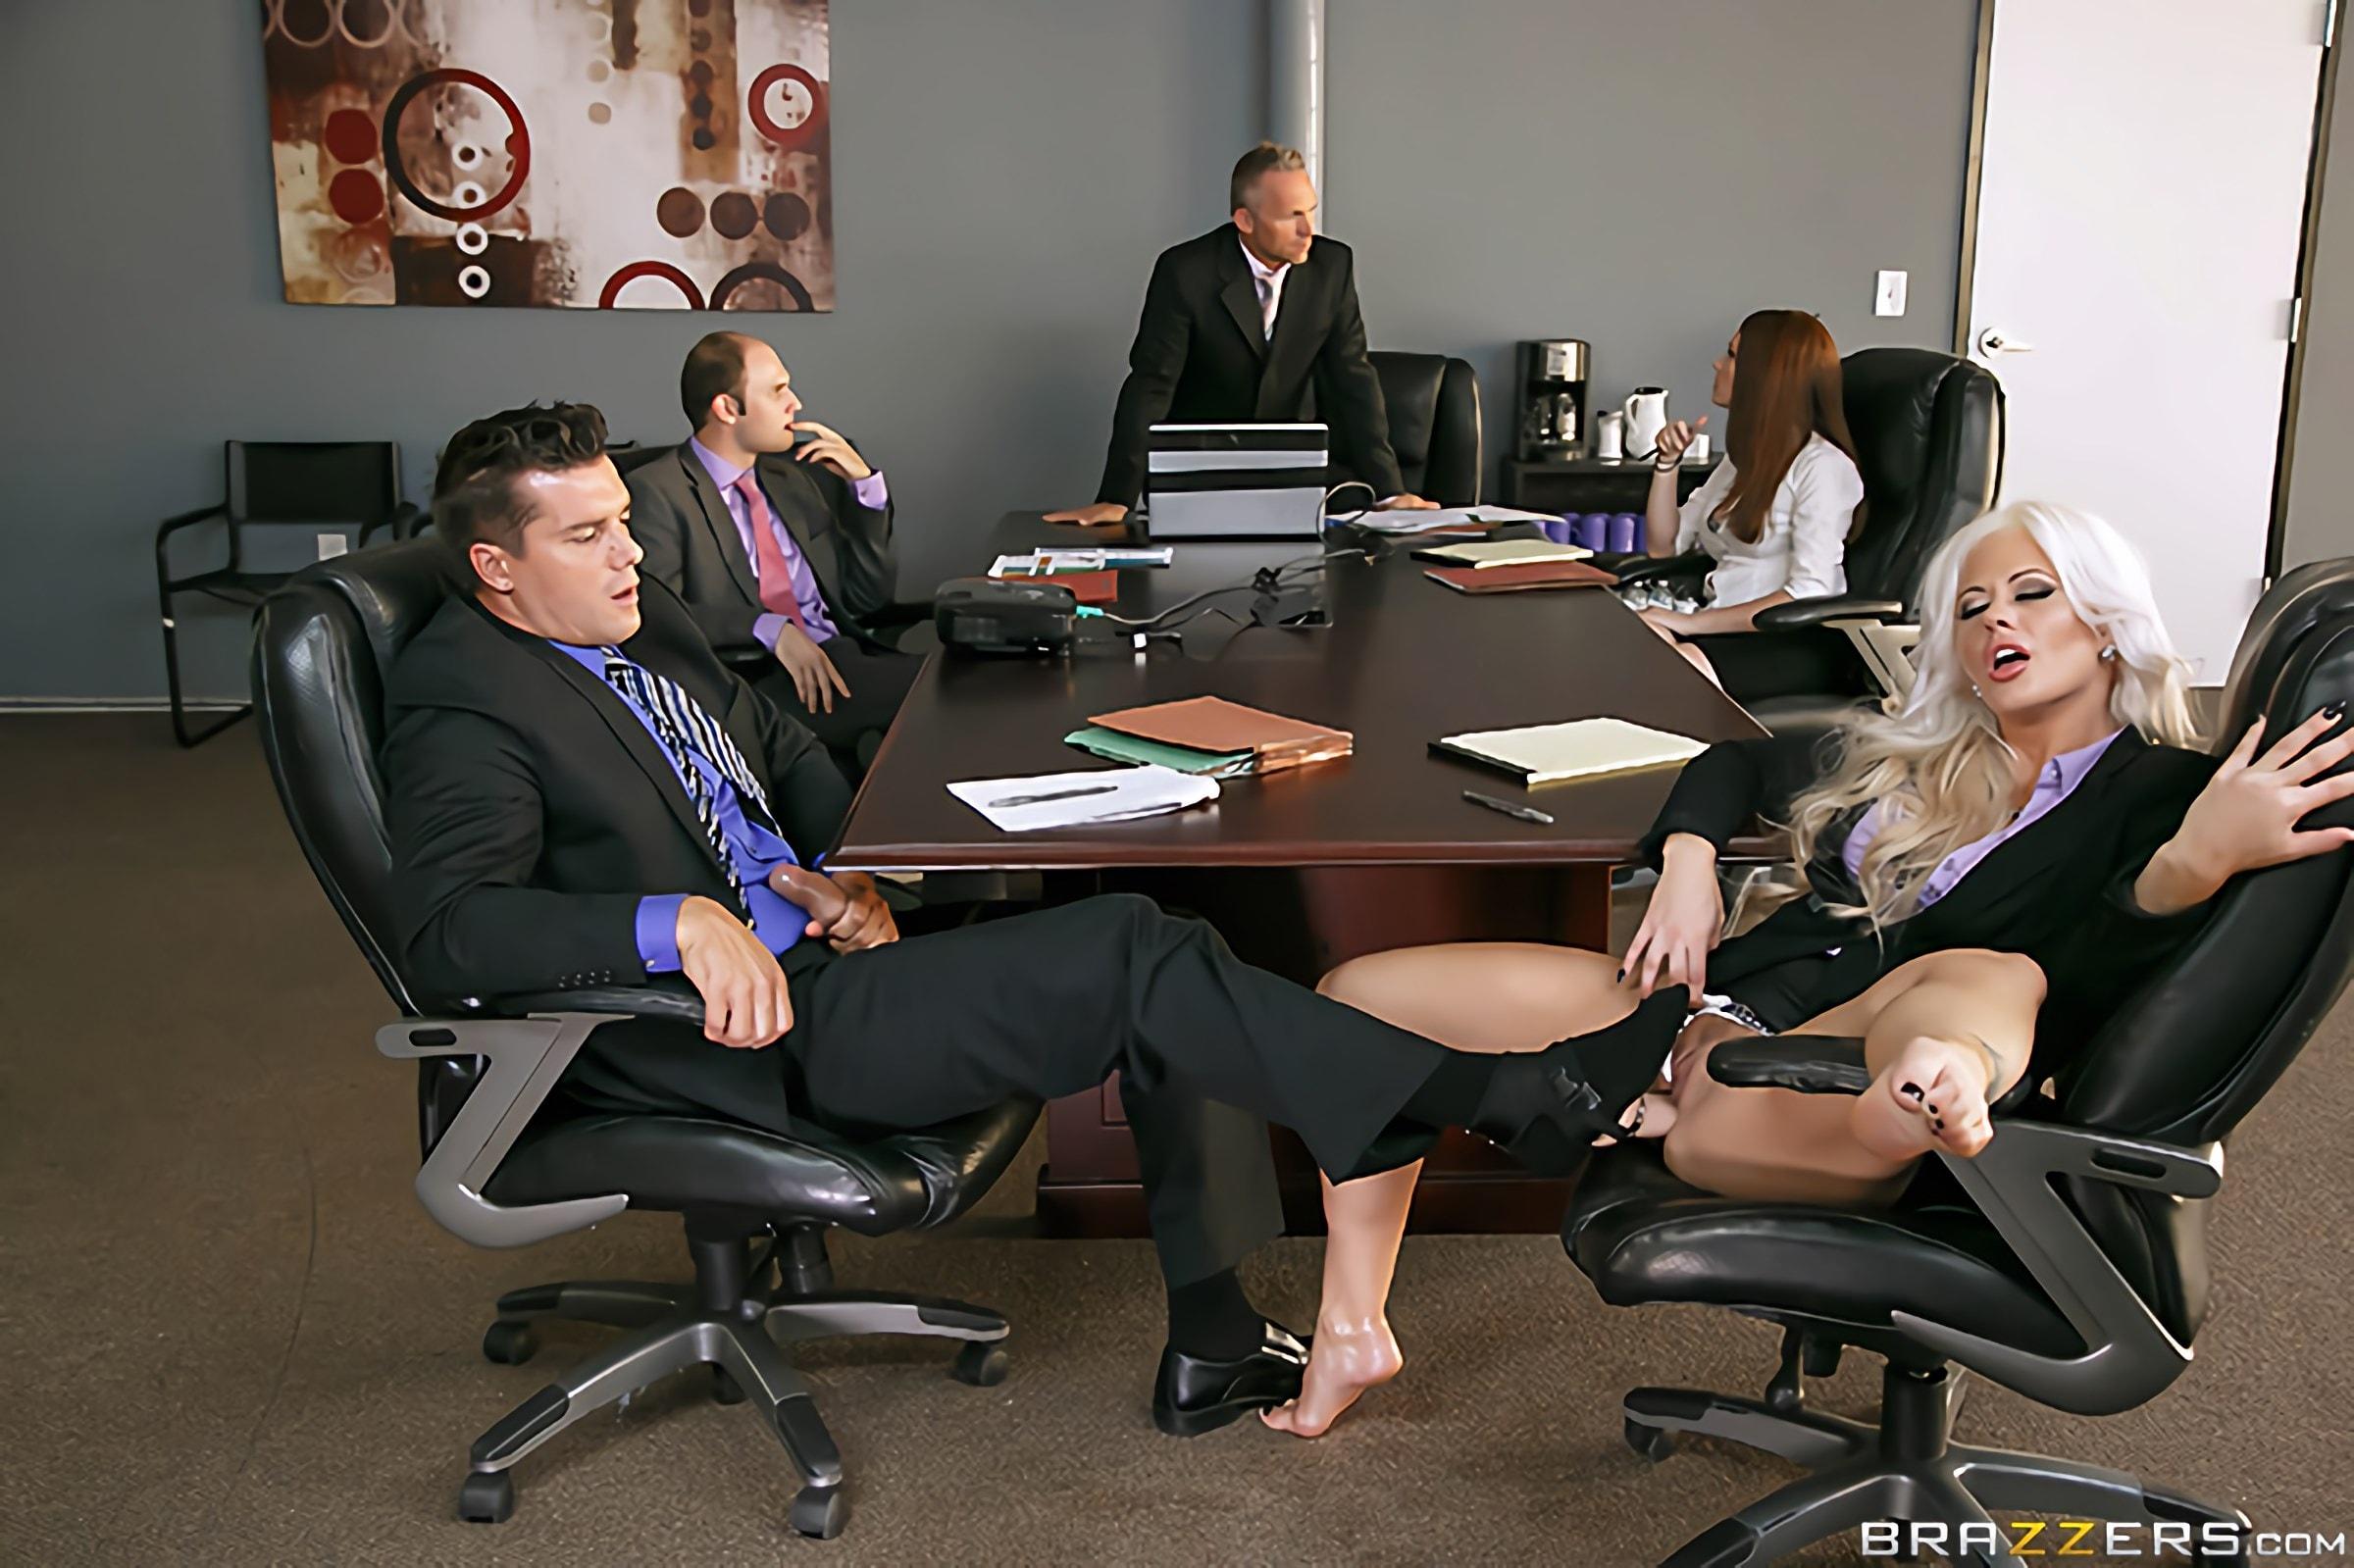 Mature meeting websites in ontario